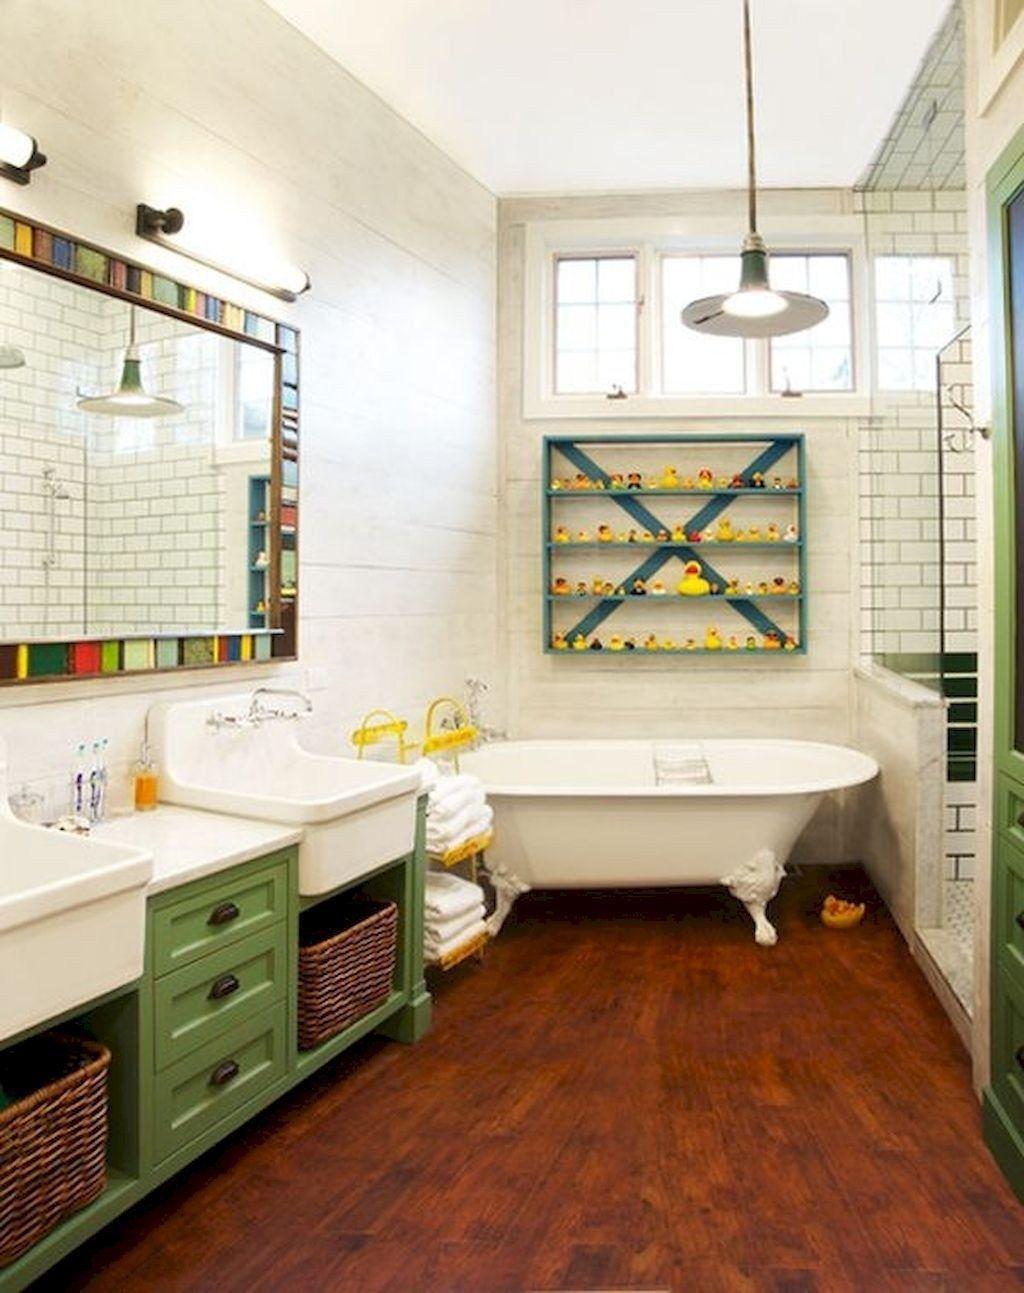 Bathroom Decor Ideas Quarter Bathroom Decor Bathroom Decor Photos Bathroom Decor And Green Bathr In 2020 Eclectic Bathroom Eclectic Bathroom Decor Quirky Bathroom